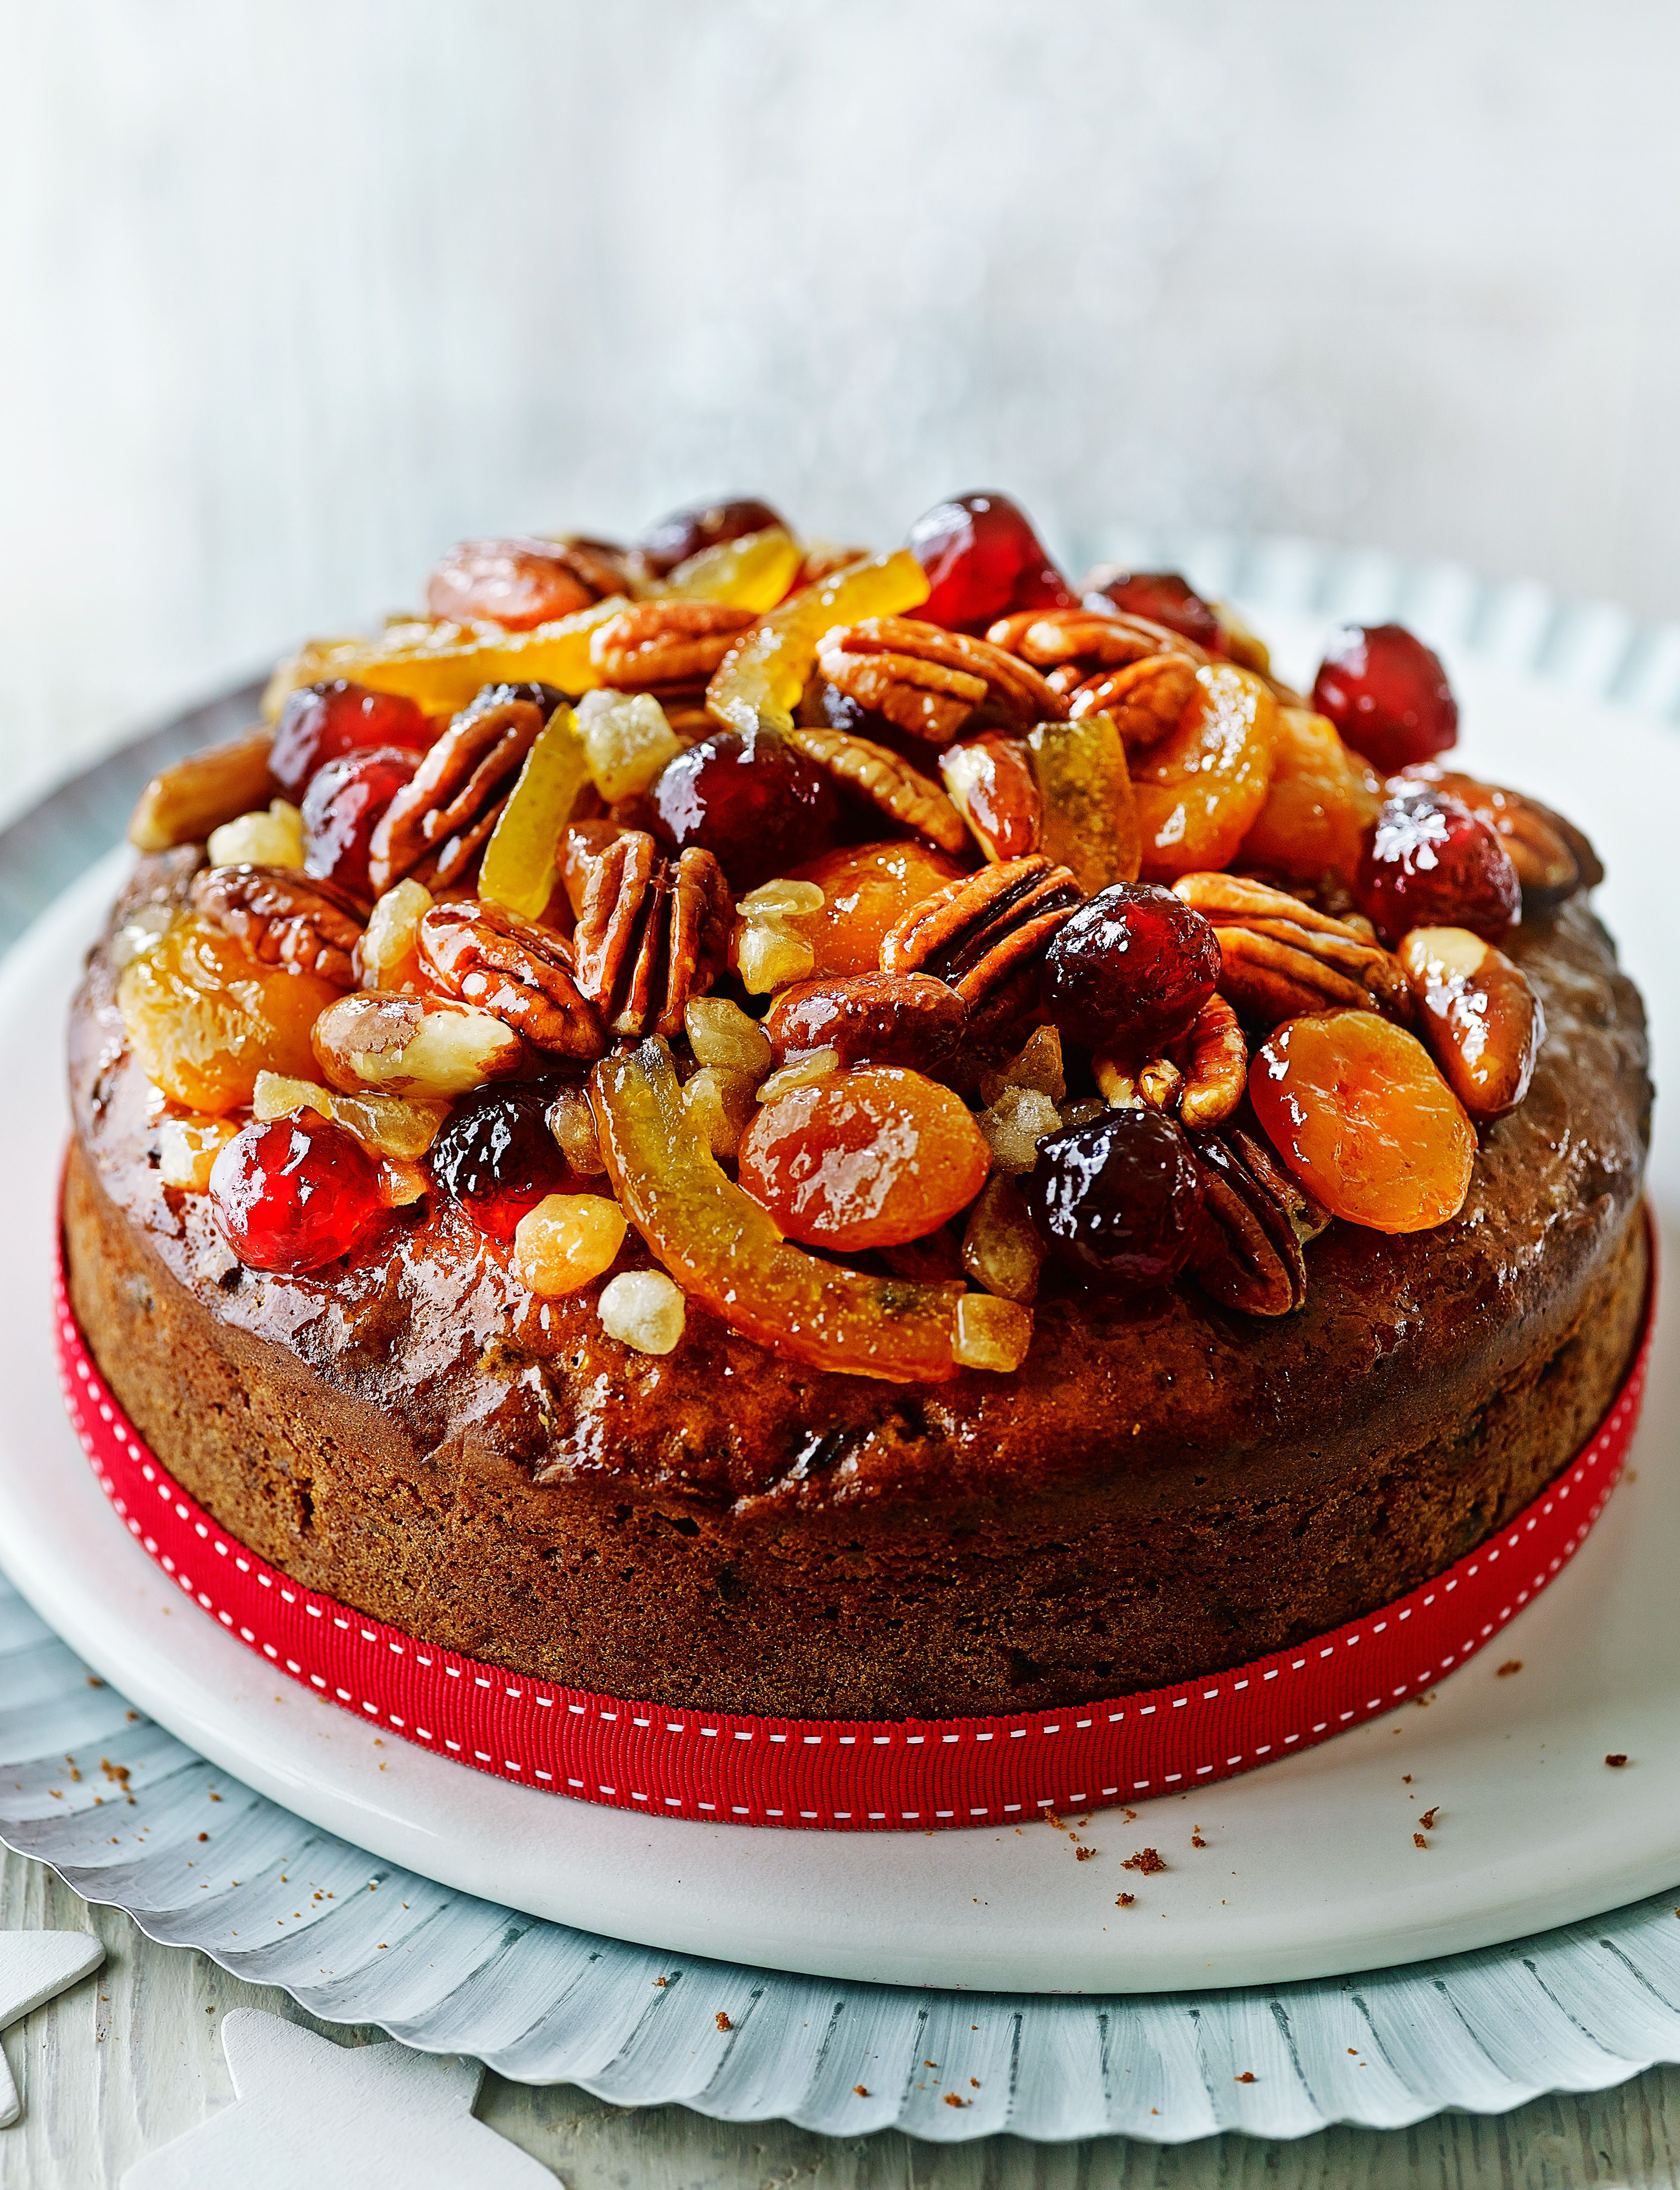 Christmas Fruit Cake With Ginger Recipe Fruit Cake Christmas Christmas Cake Recipes Christmas Cooking